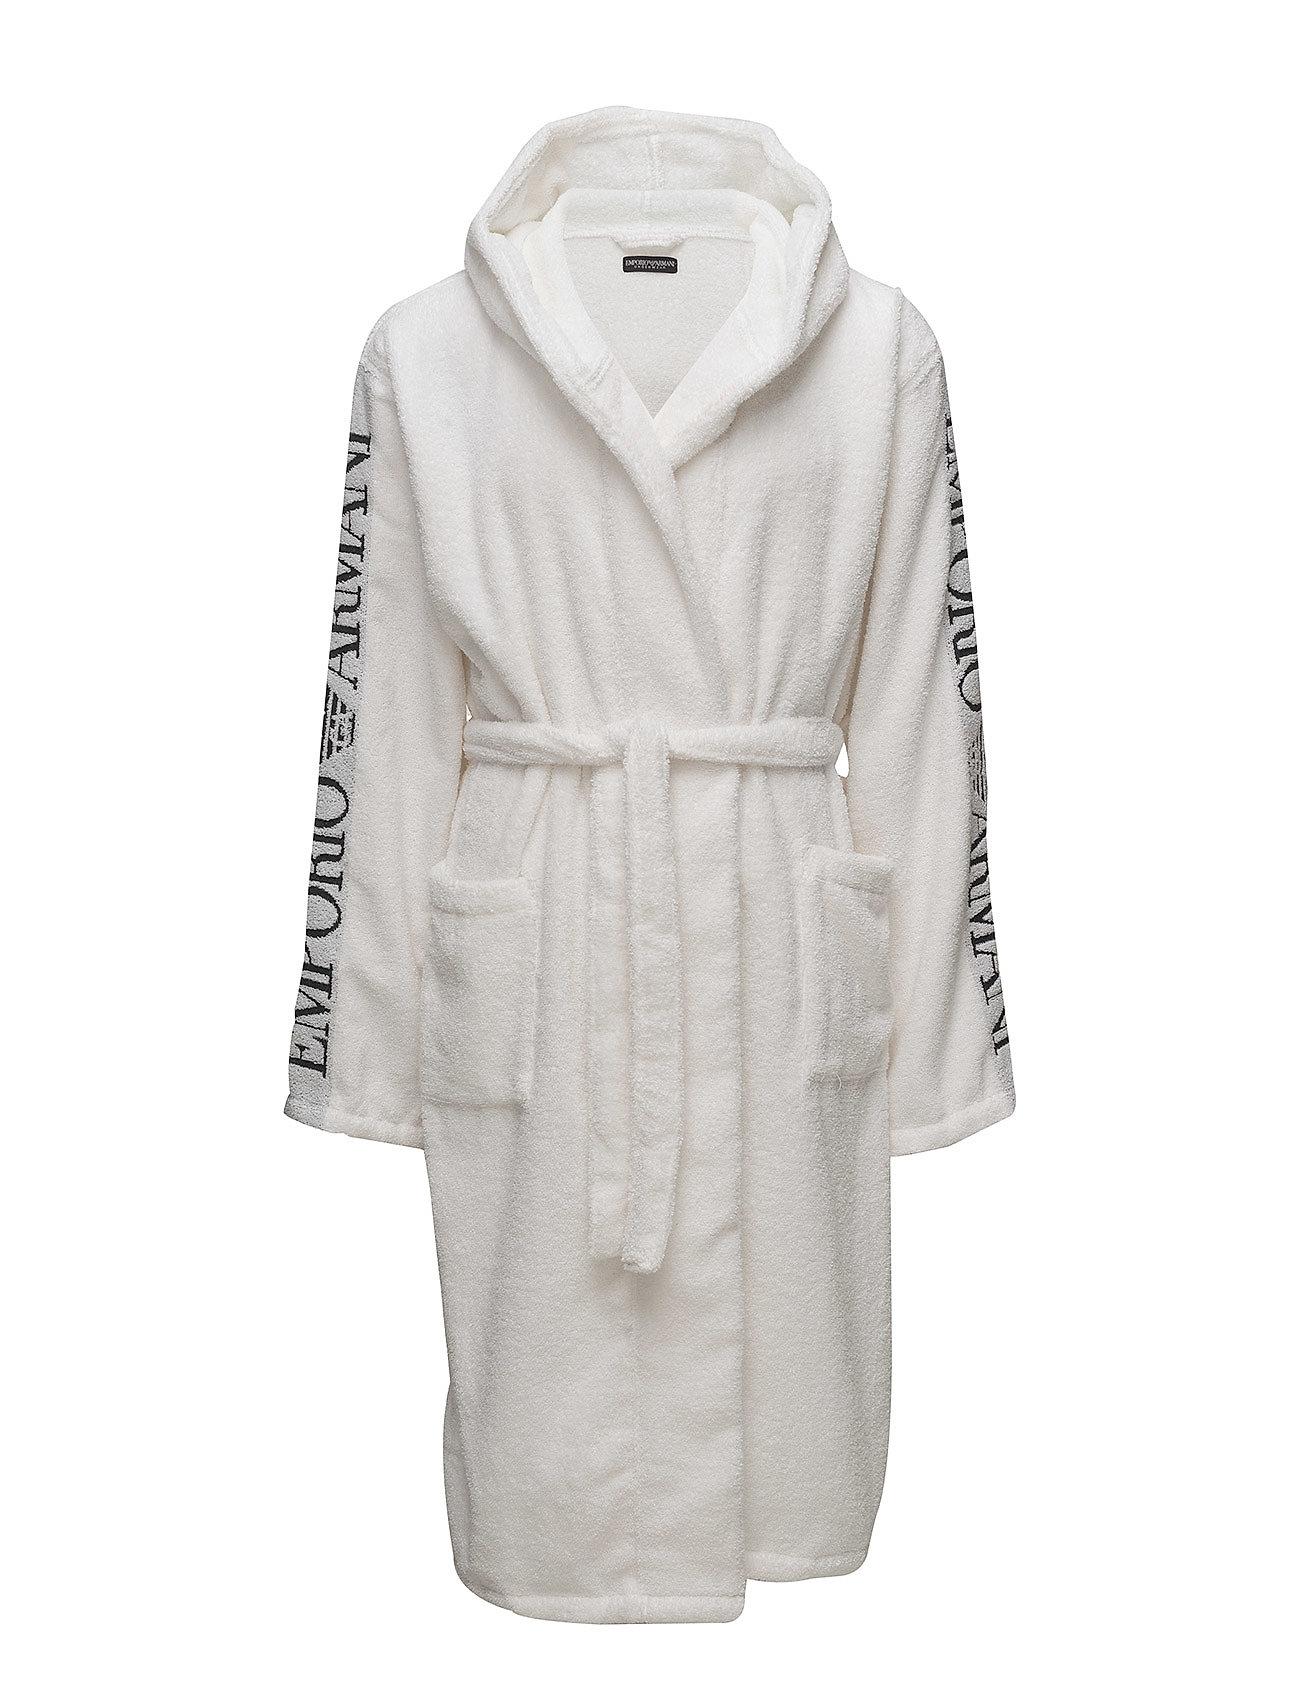 emporio armani – Men's woven bathrobe på boozt.com dk